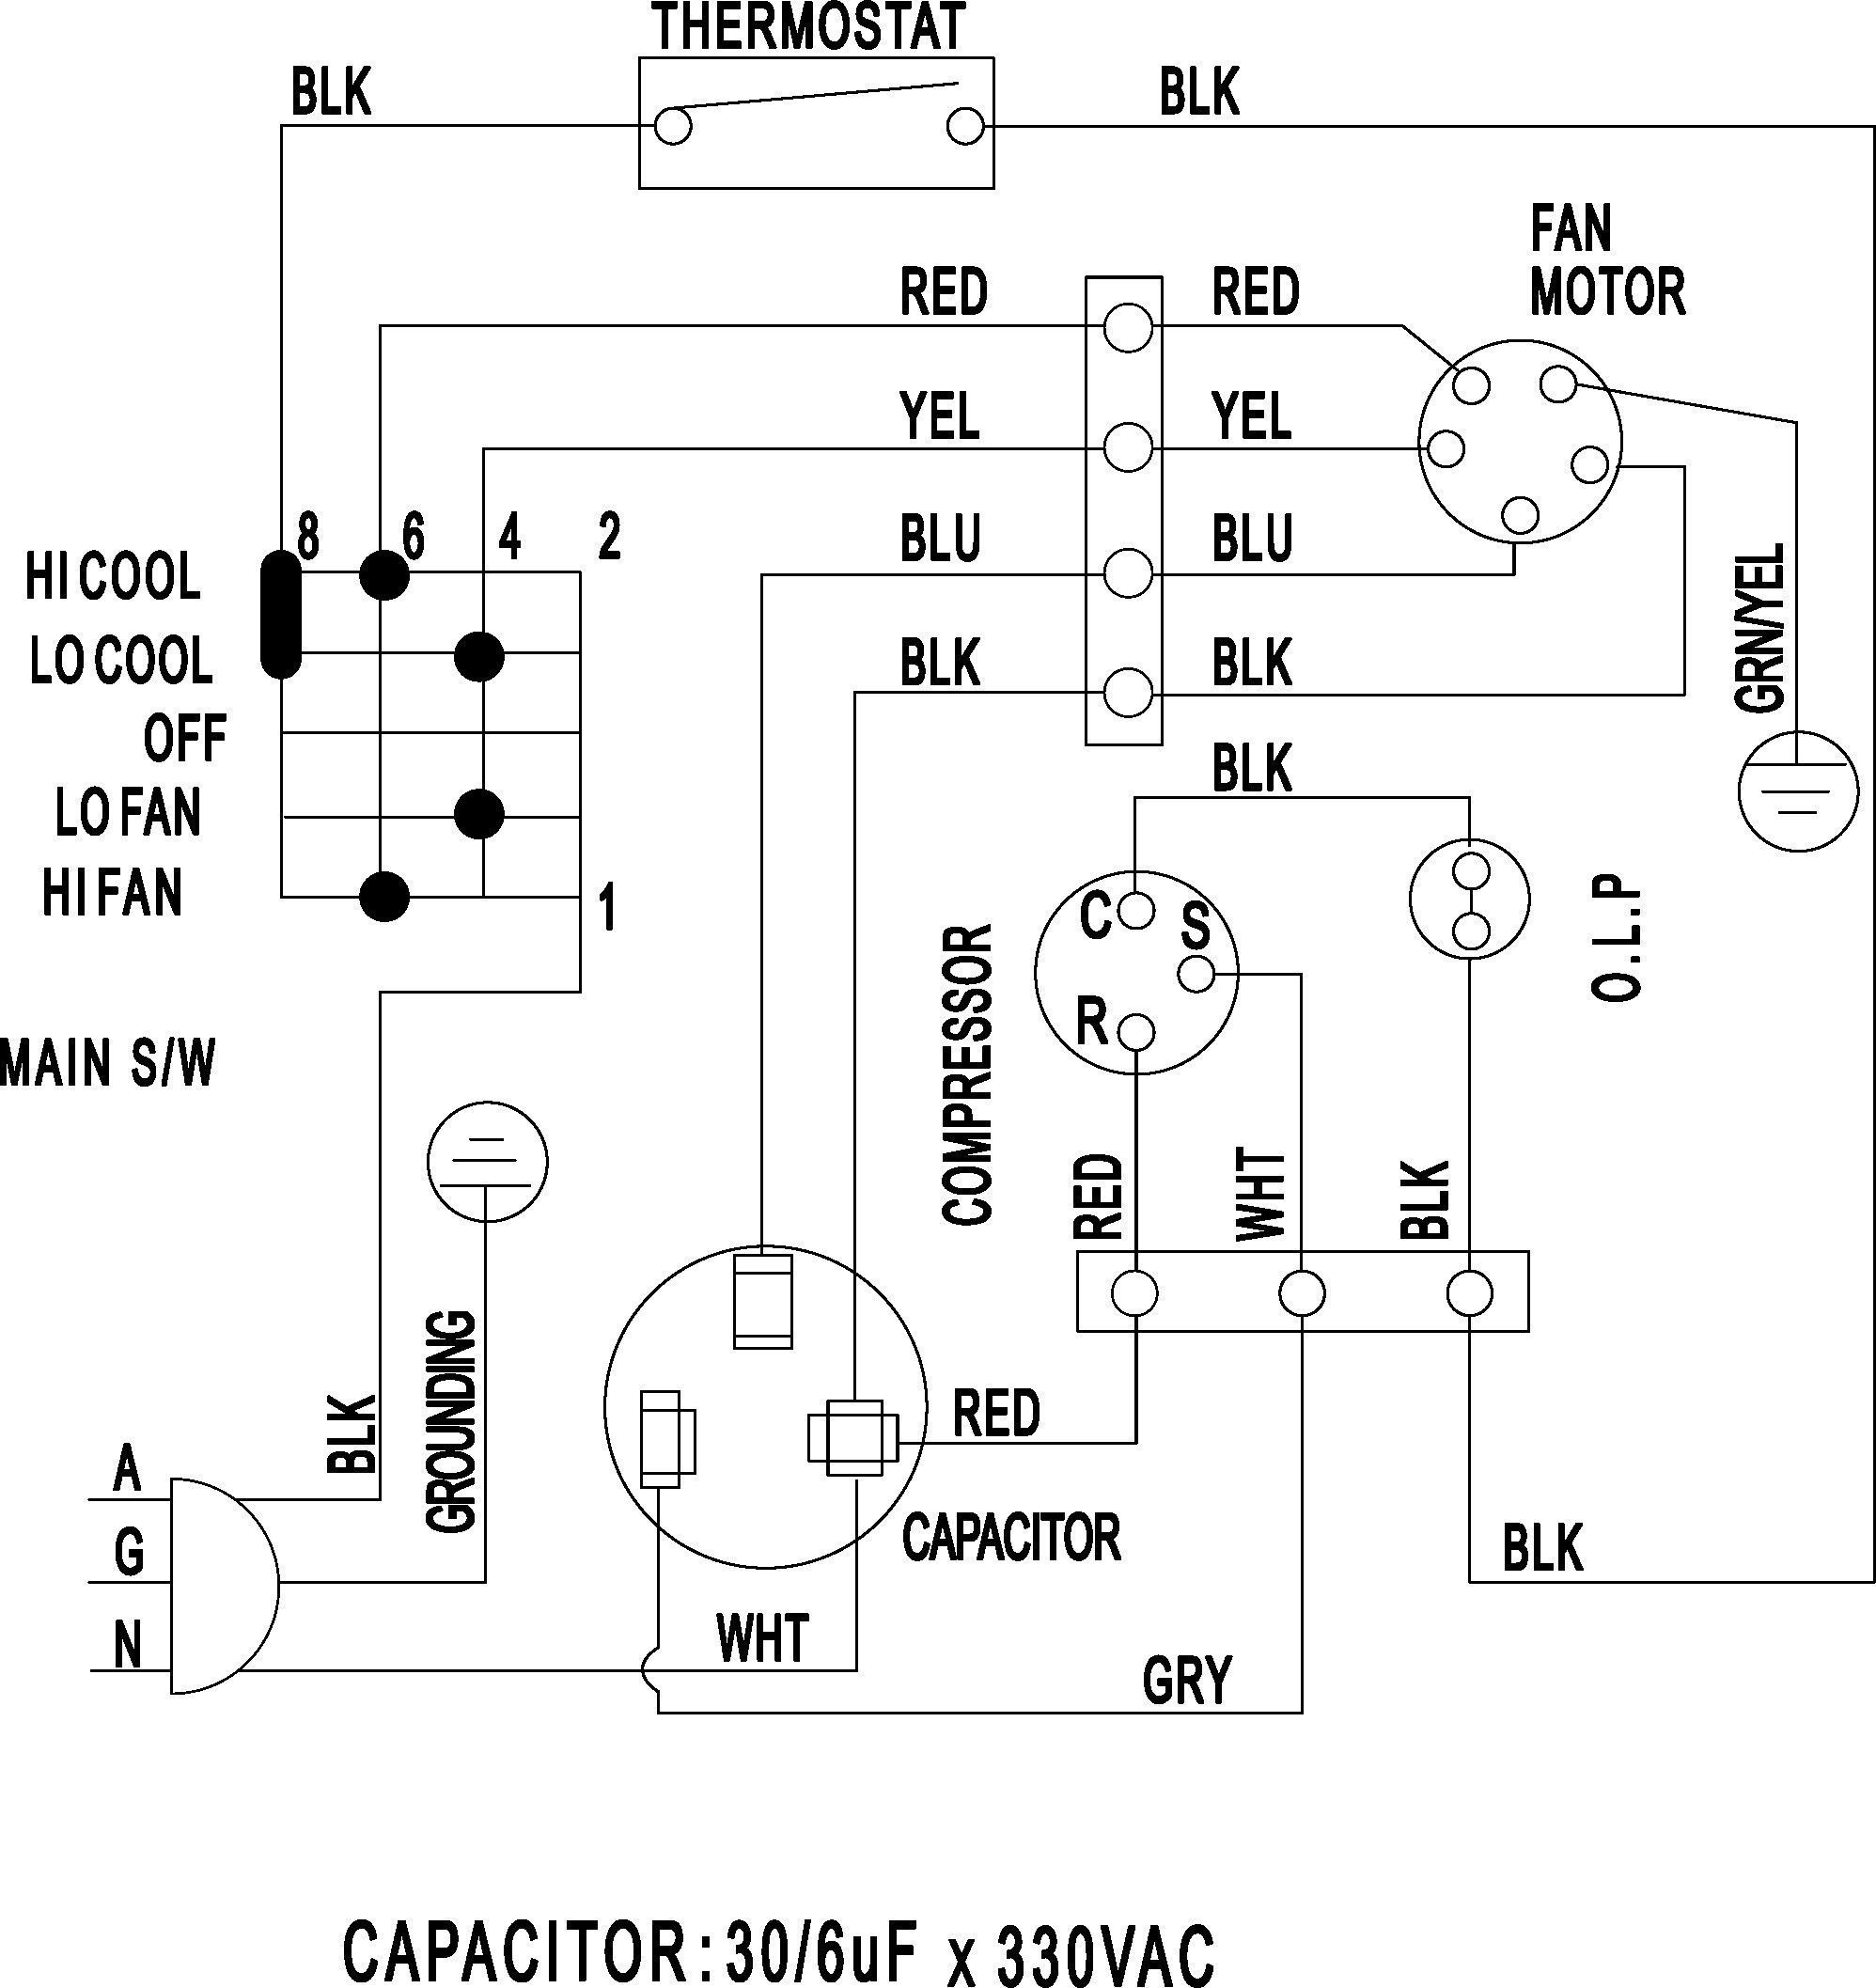 [QMVU_8575]  Unique Ac Panel Wiring Diagram #diagram #diagramtemplate #diagramsample   Ac  wiring, Electrical circuit diagram, Thermostat wiring   Ac Panel Wiring Diagram      Pinterest